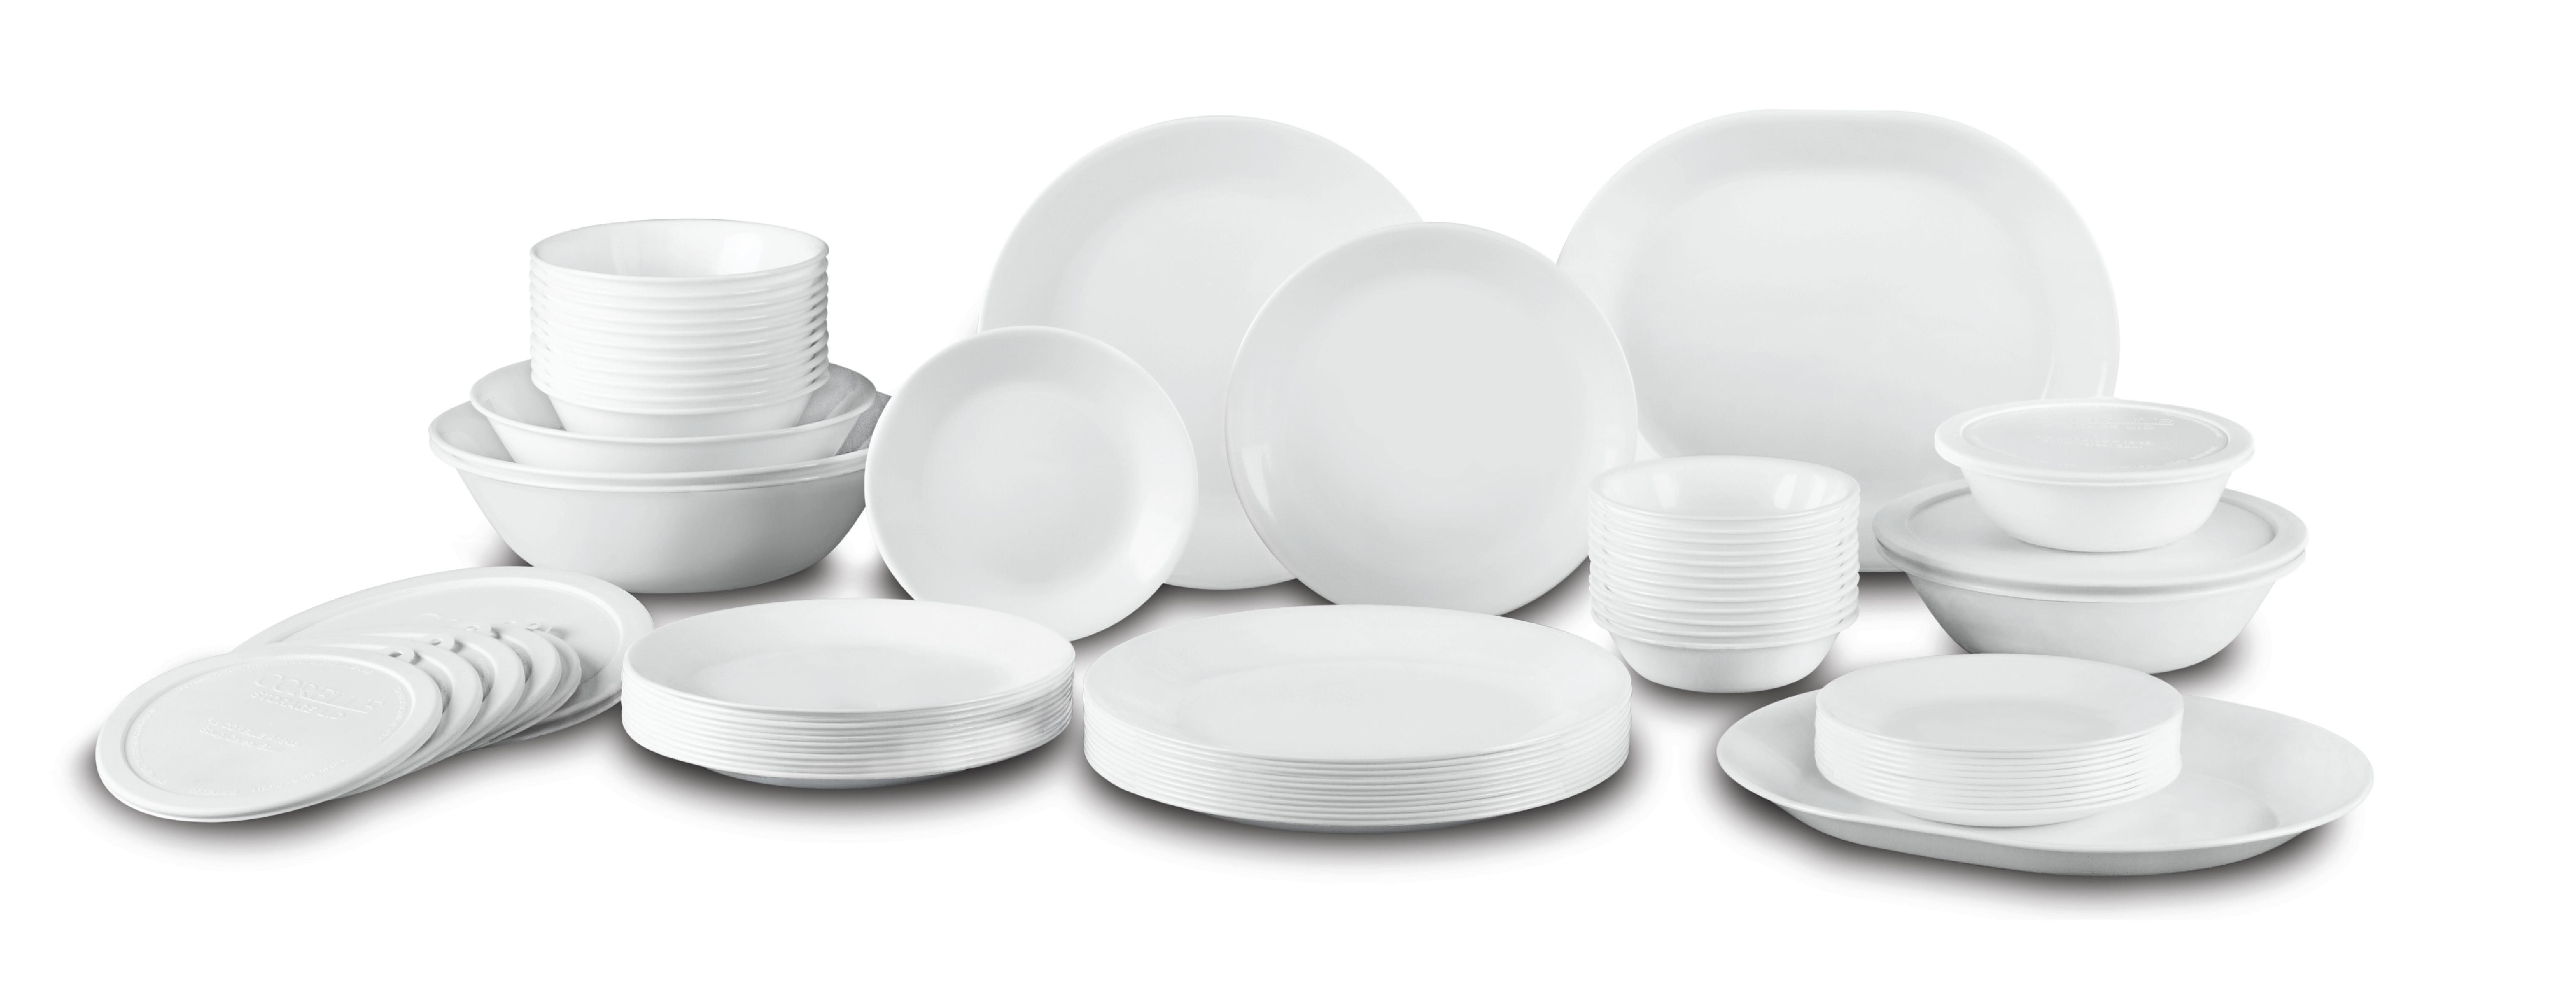 Buy Corelle Livingware 74 Piece Dinnerware Set With